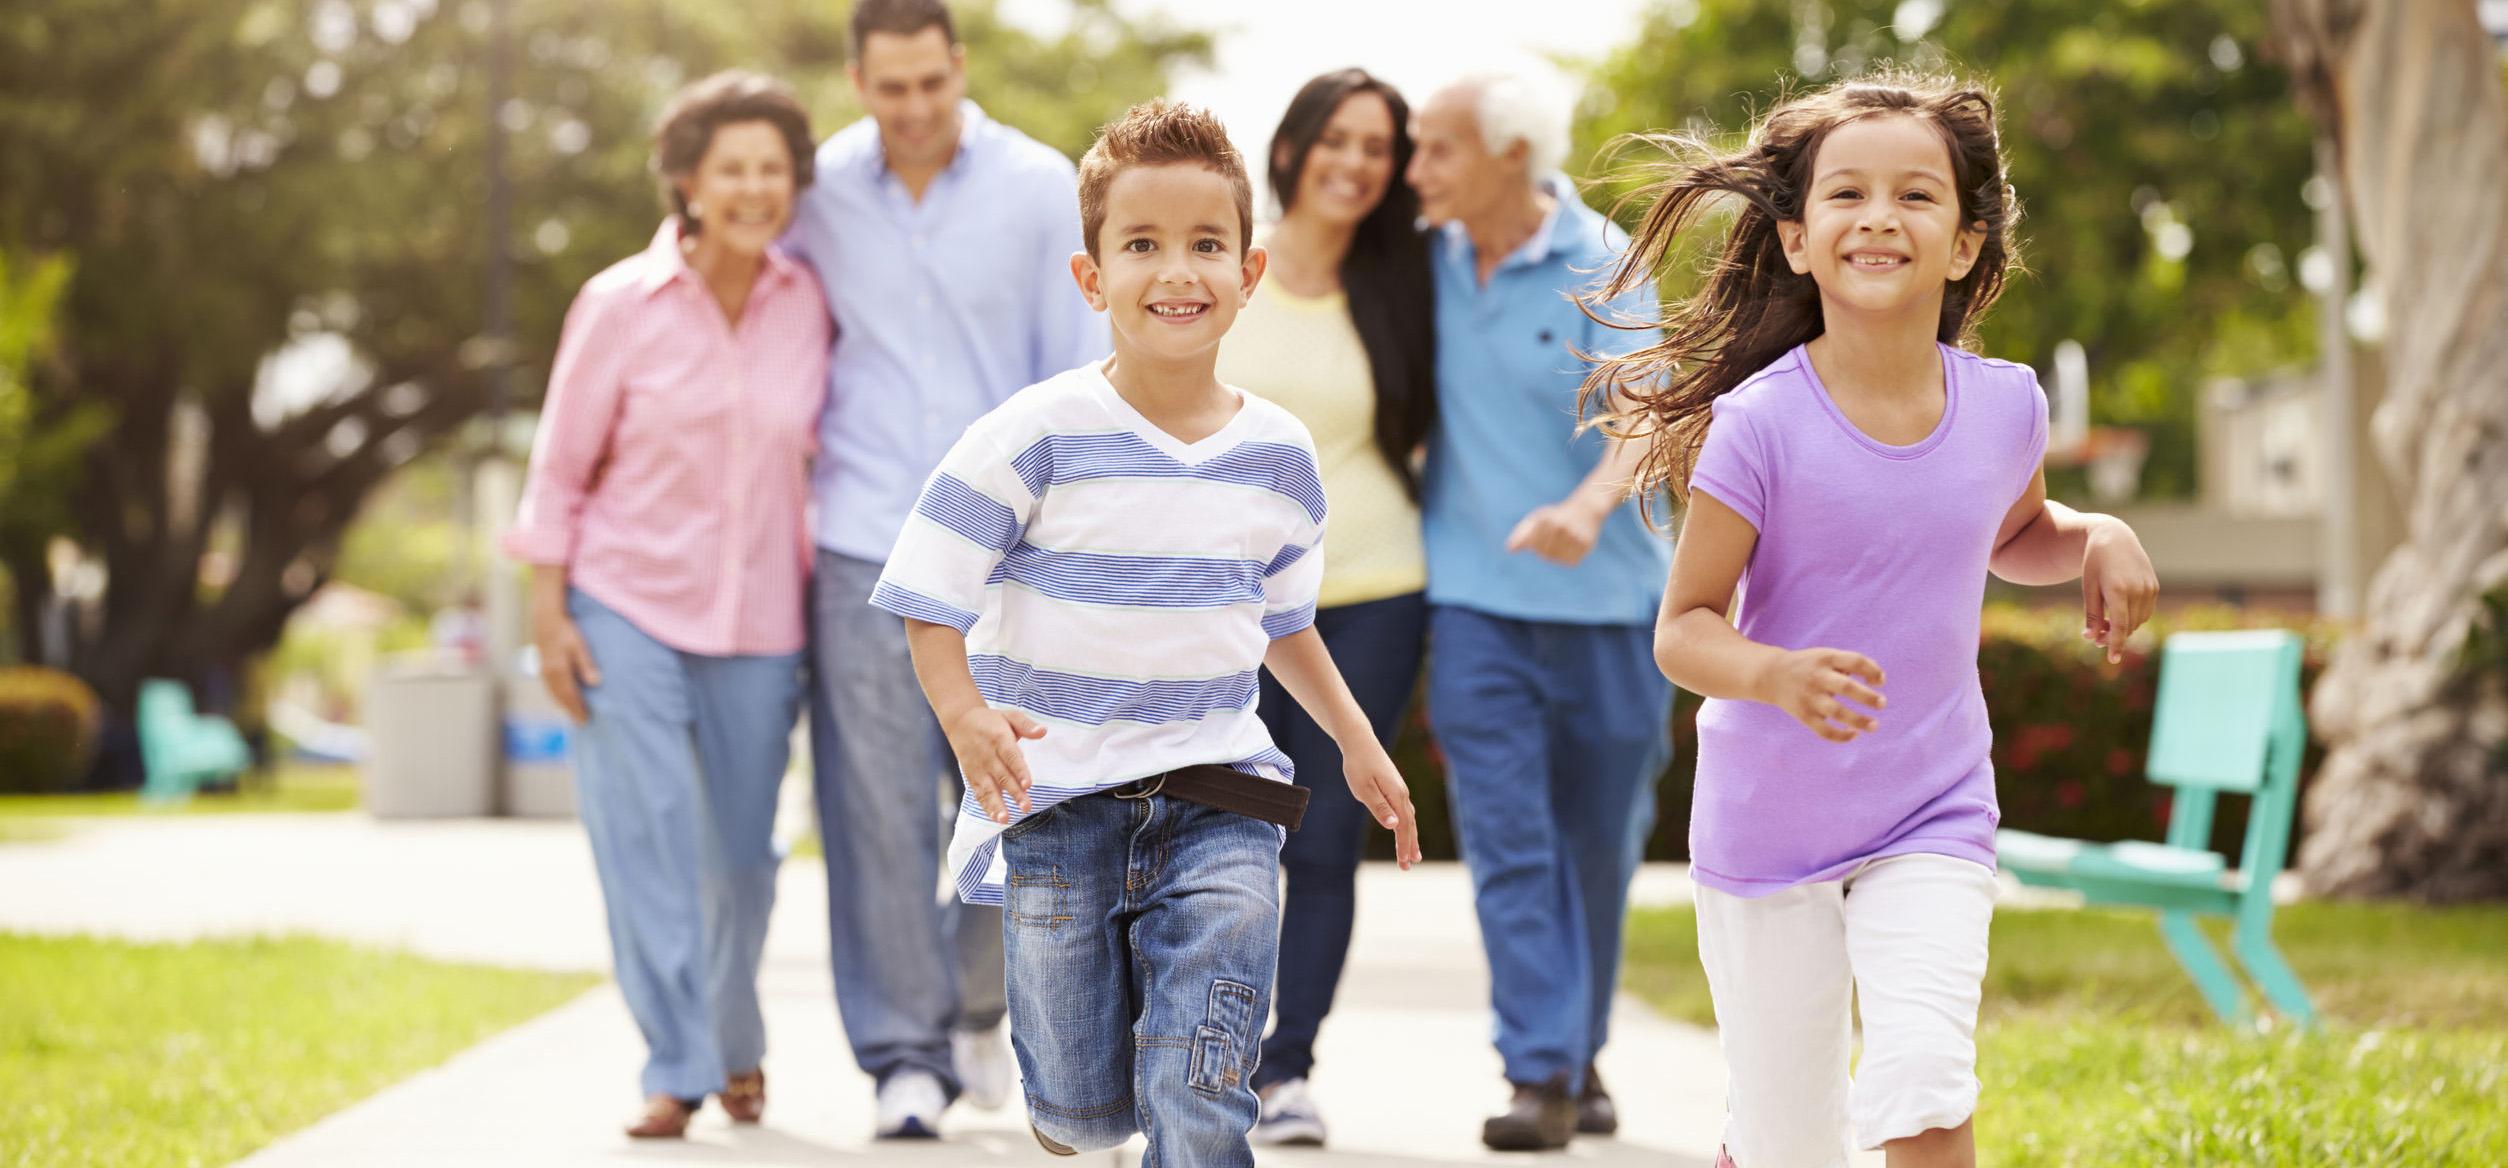 Multi generational family walking in park